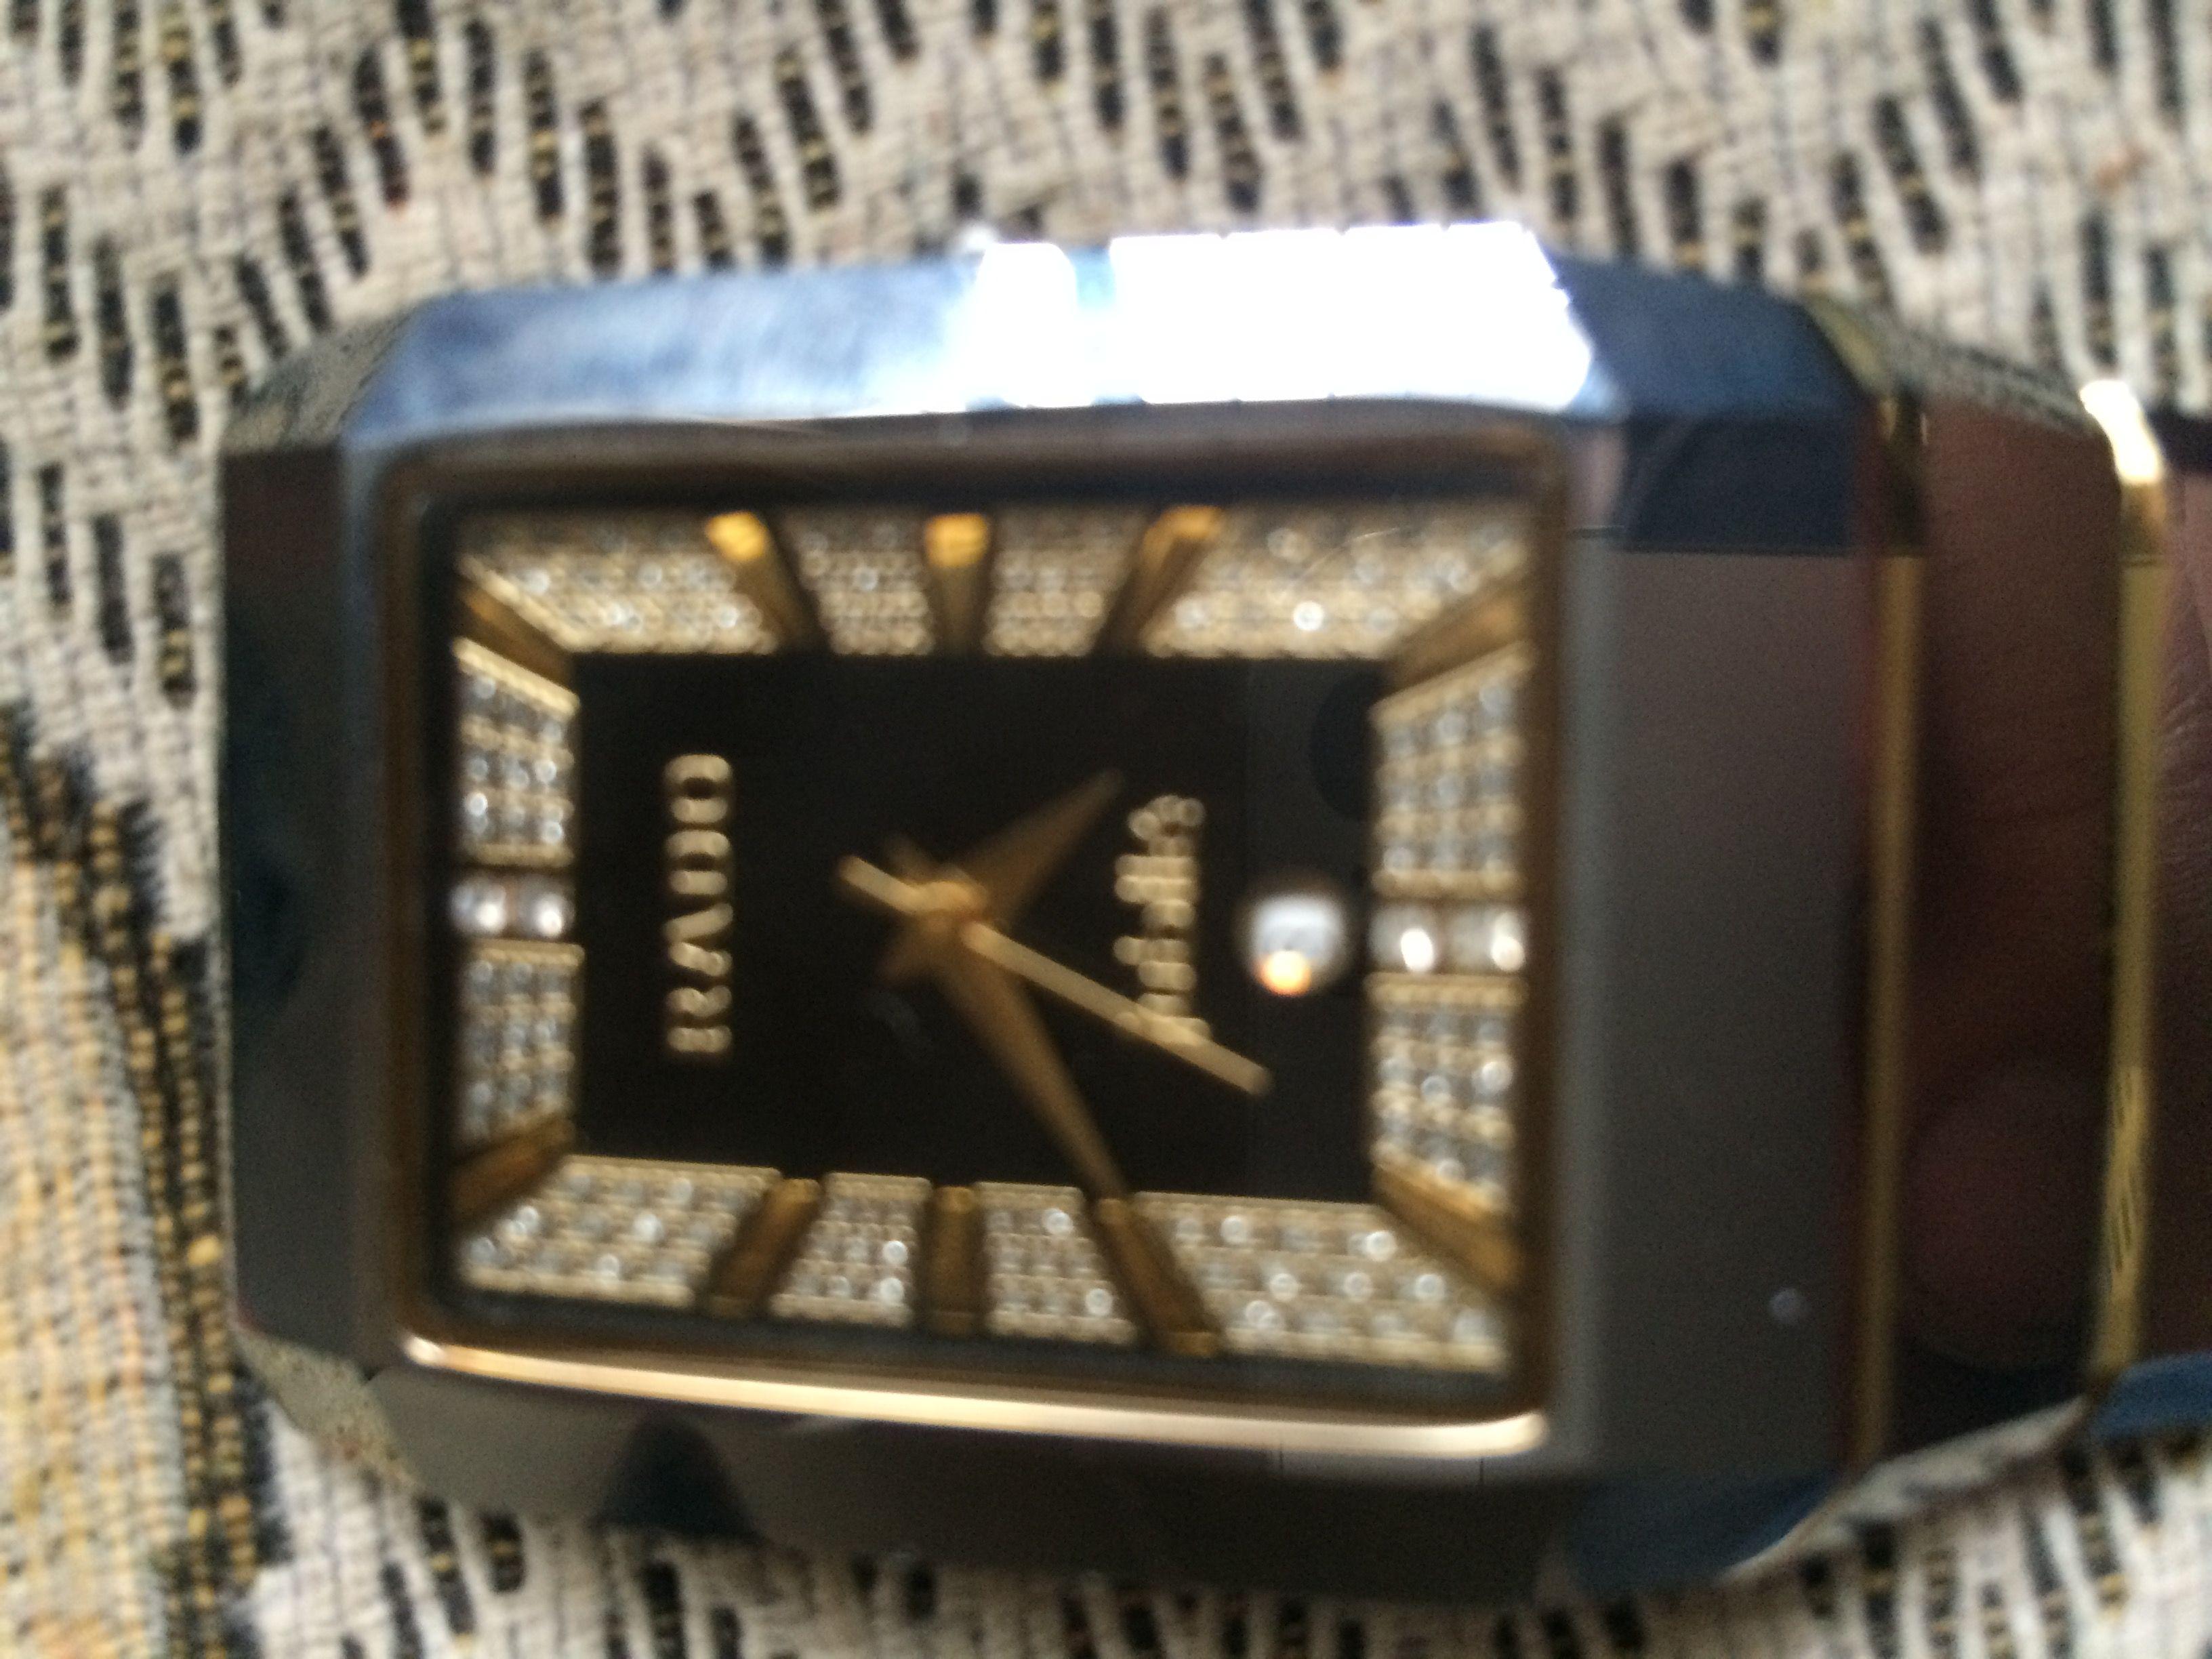 radojubile系列_rado手表jubile系列,请问这个表是真的吗?价格多少?